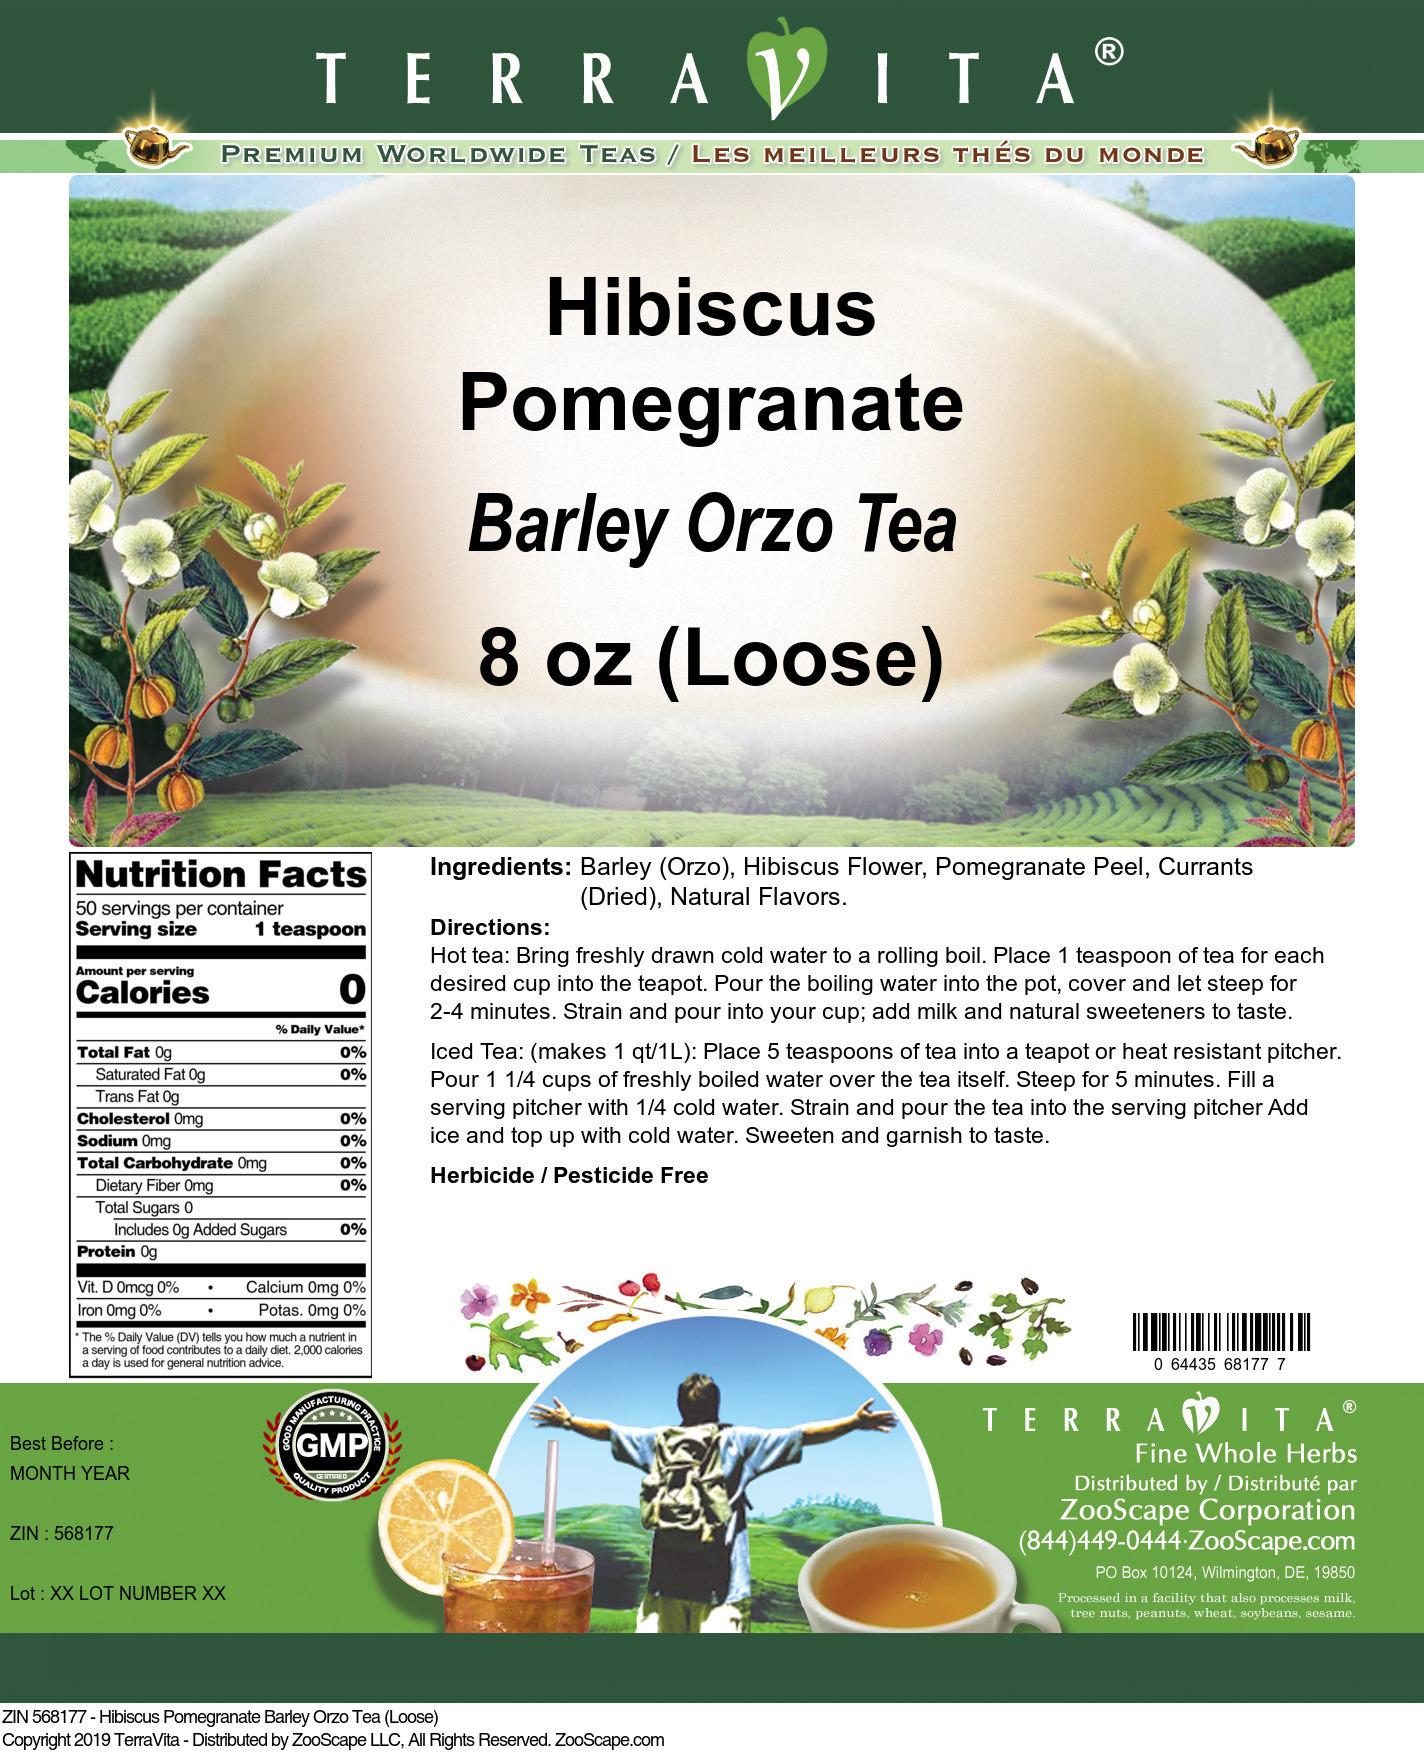 Hibiscus Pomegranate Barley Orzo Tea (Loose)